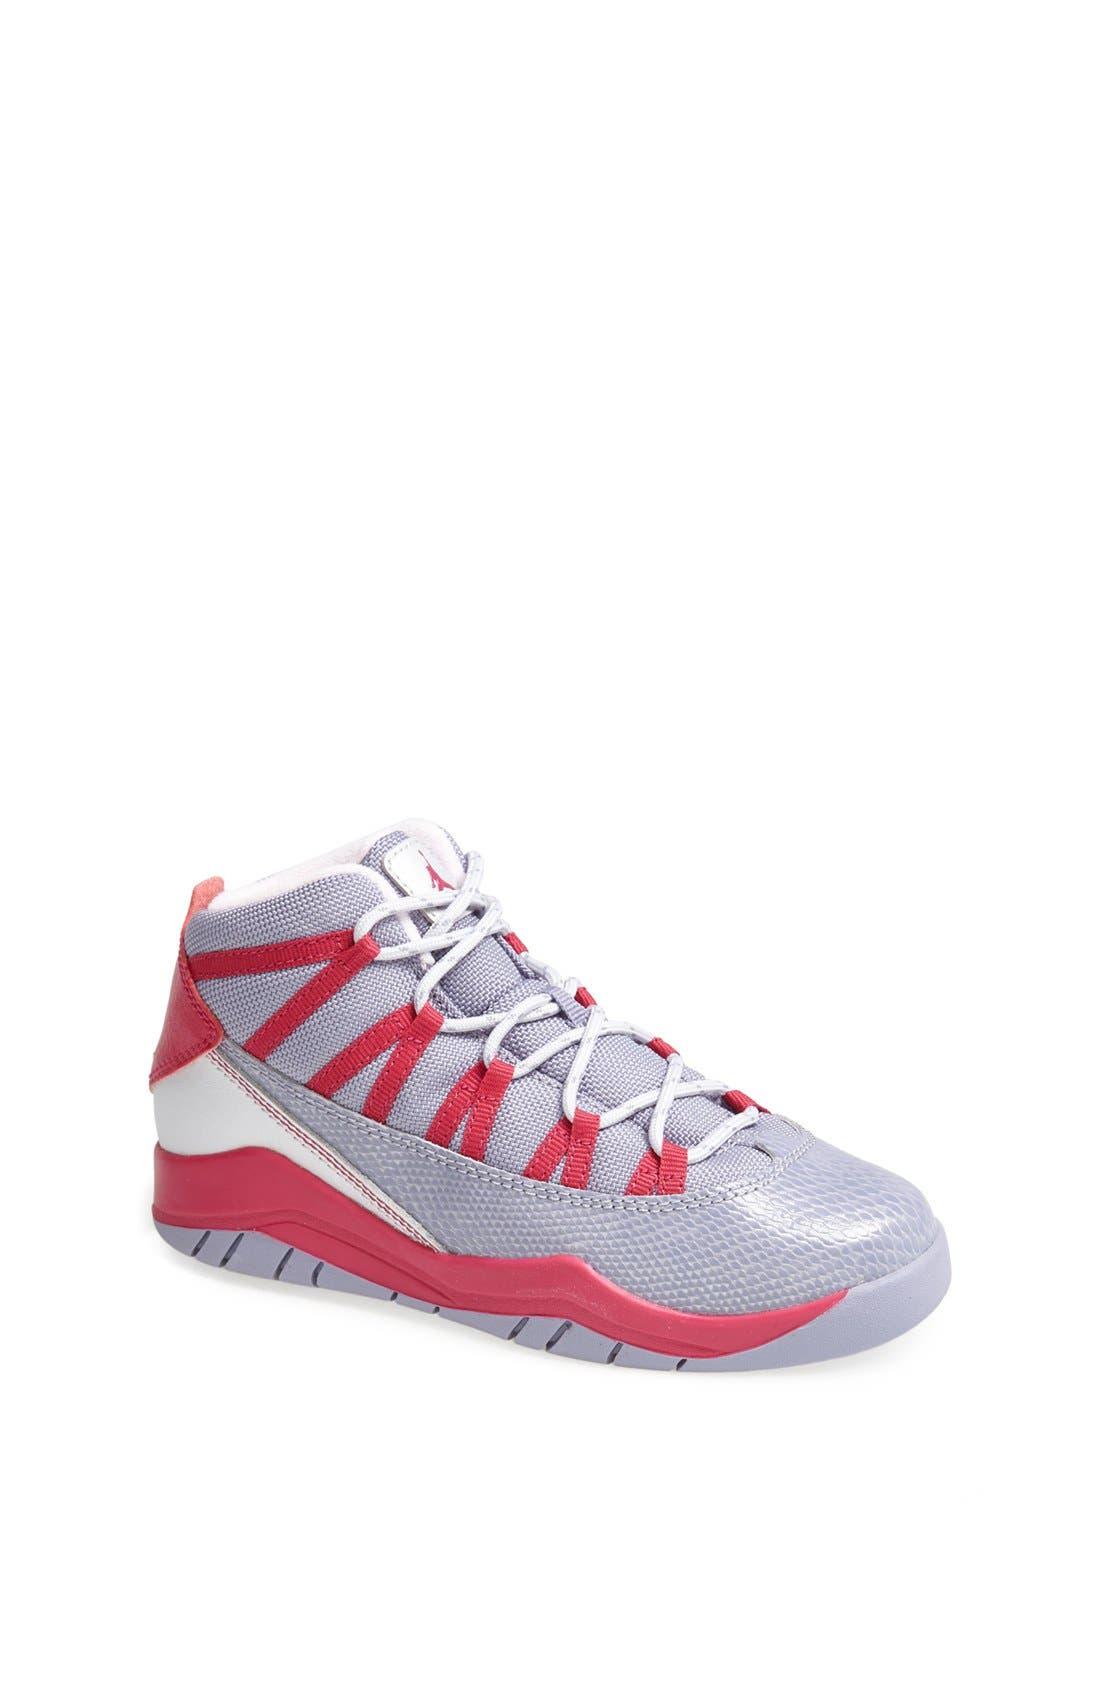 Alternate Image 1 Selected - Nike 'Jordan Prime Flight' Basketball Shoe (Toddler & Little Kid)